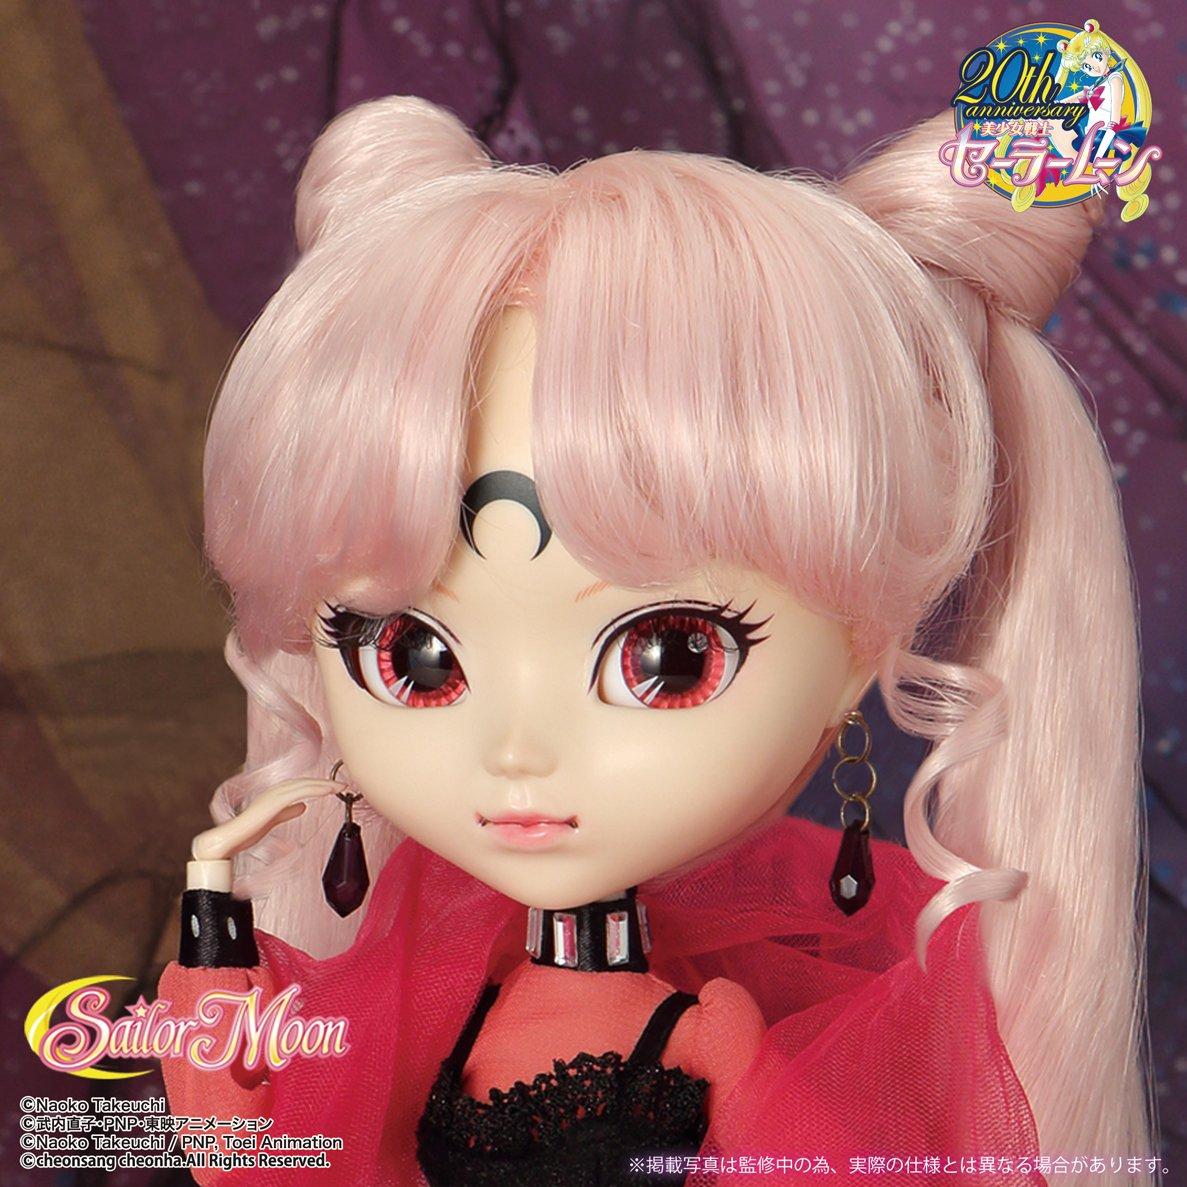 Pullip Sailor Moon Black Lady P-154 by Pullip (Image #5)